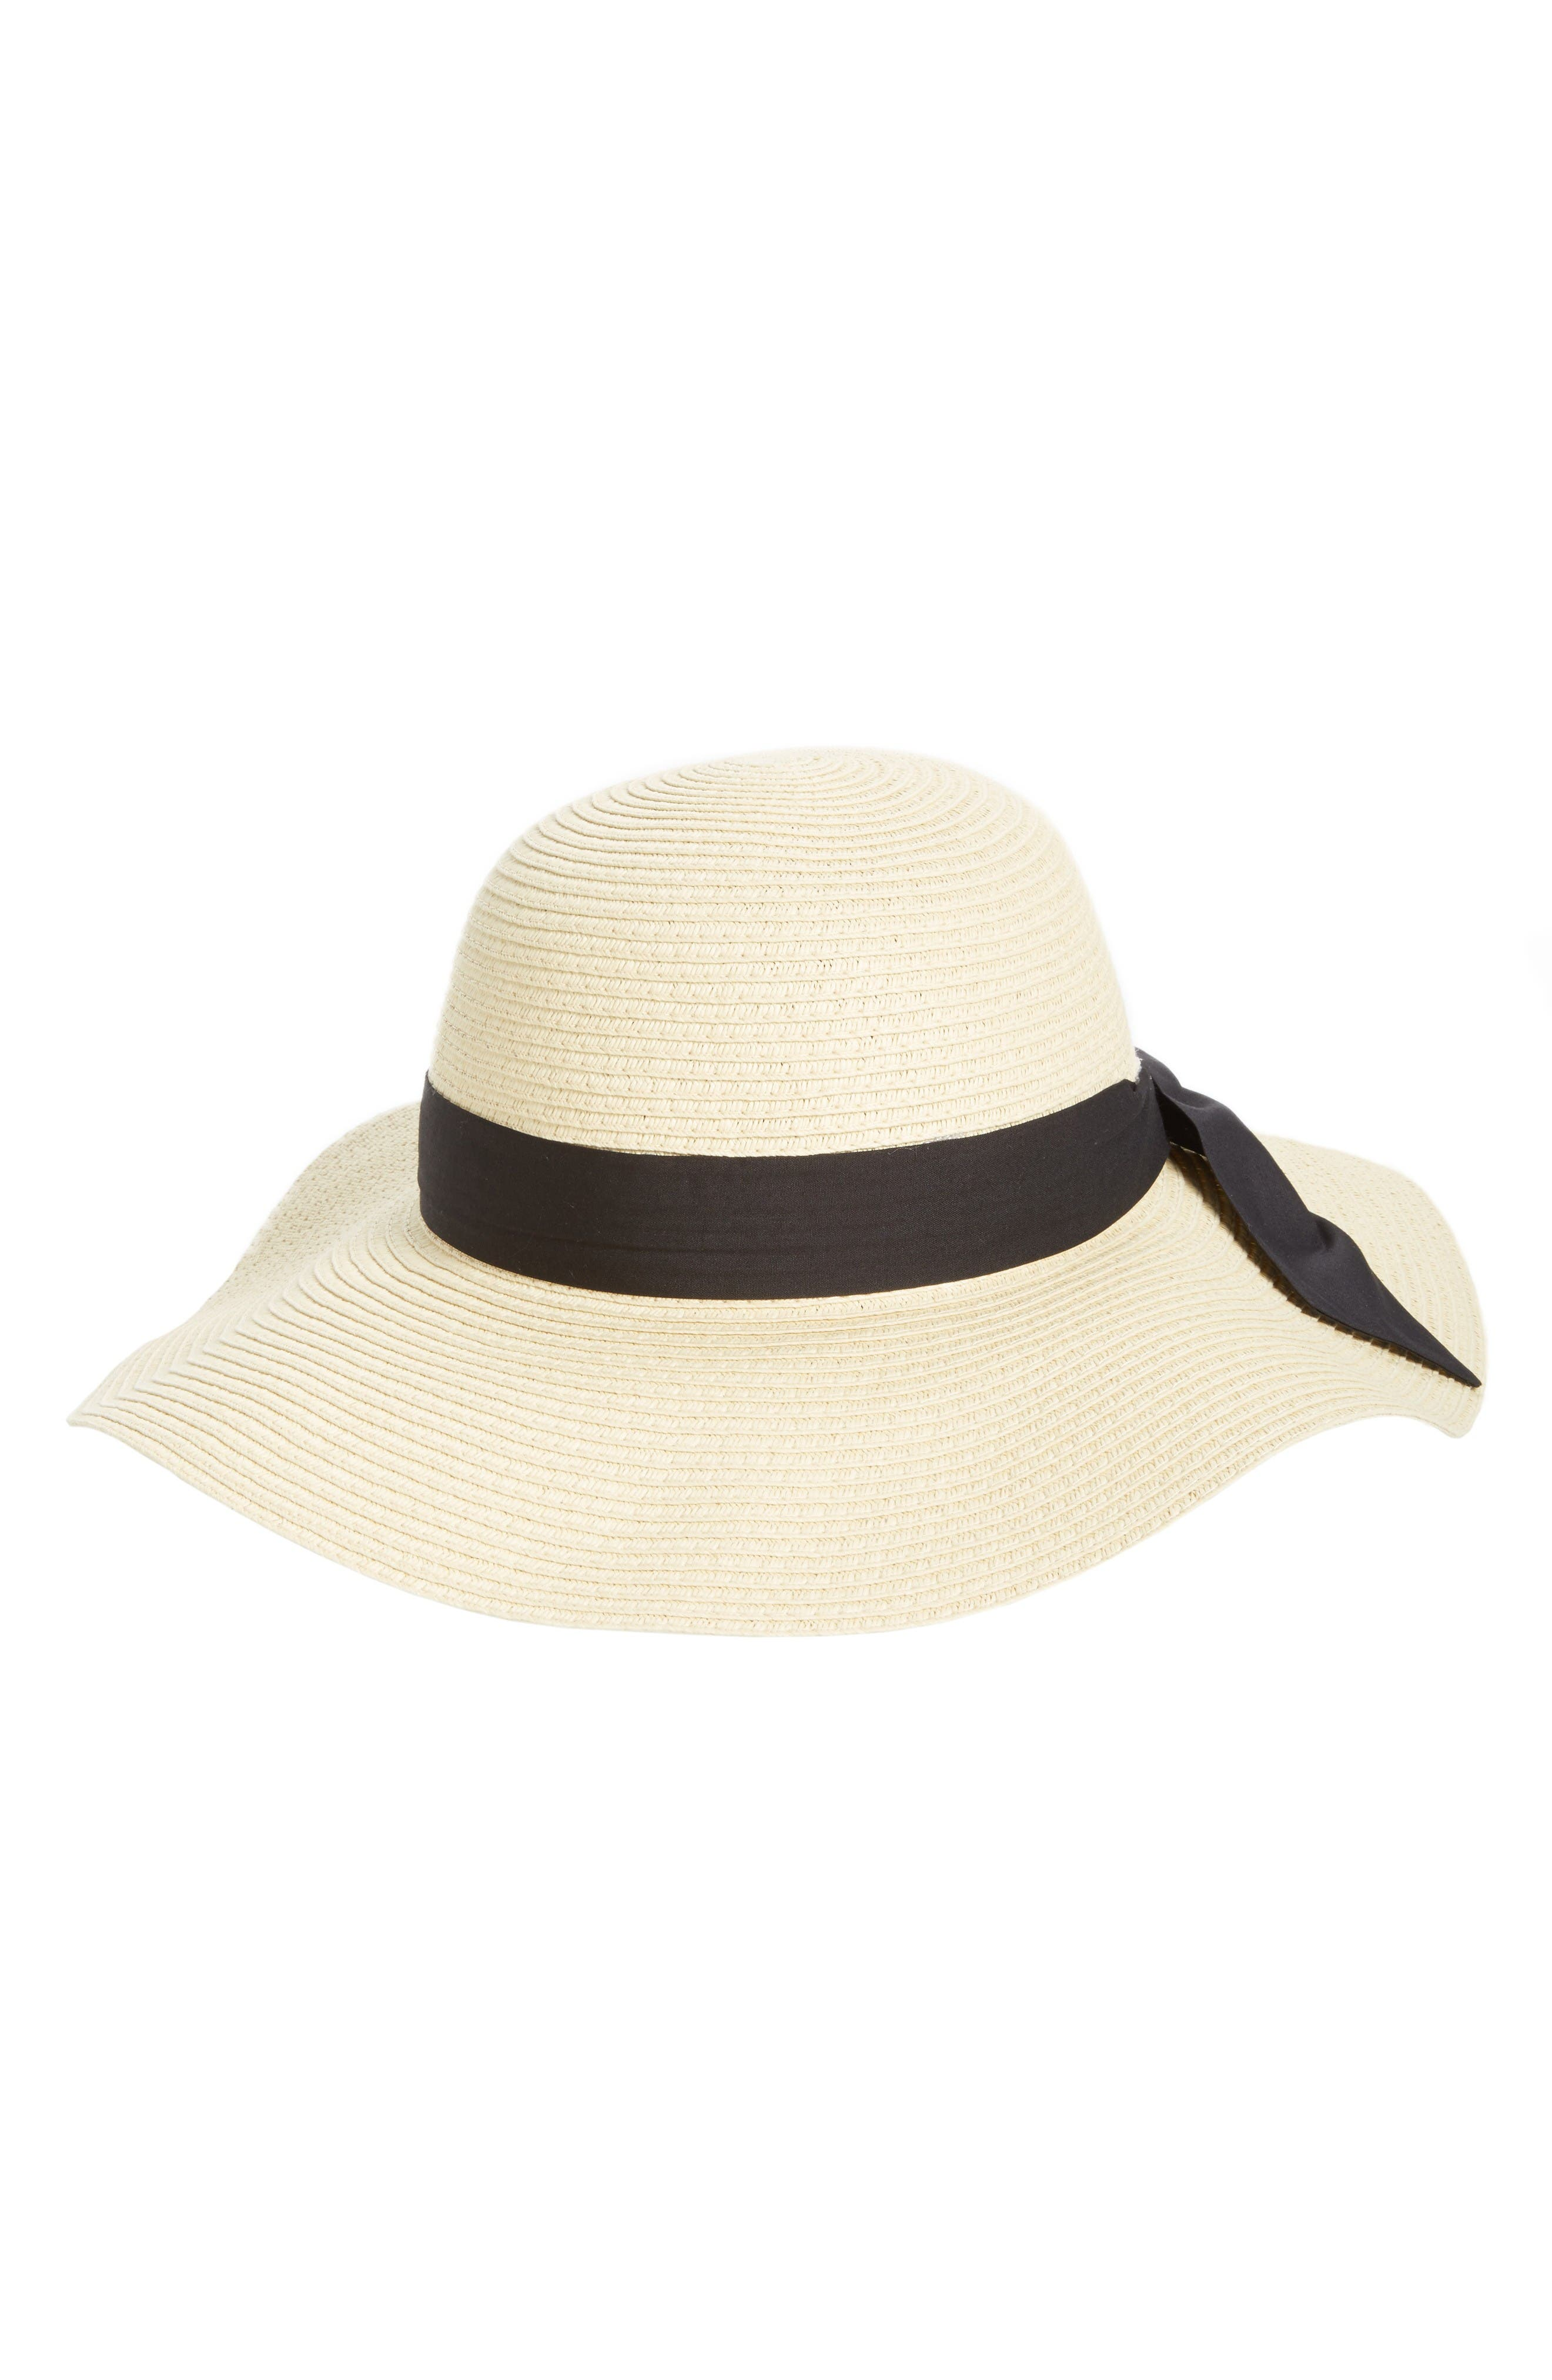 Bow Band Floppy Straw Hat,                             Main thumbnail 1, color,                             Natural/ Black